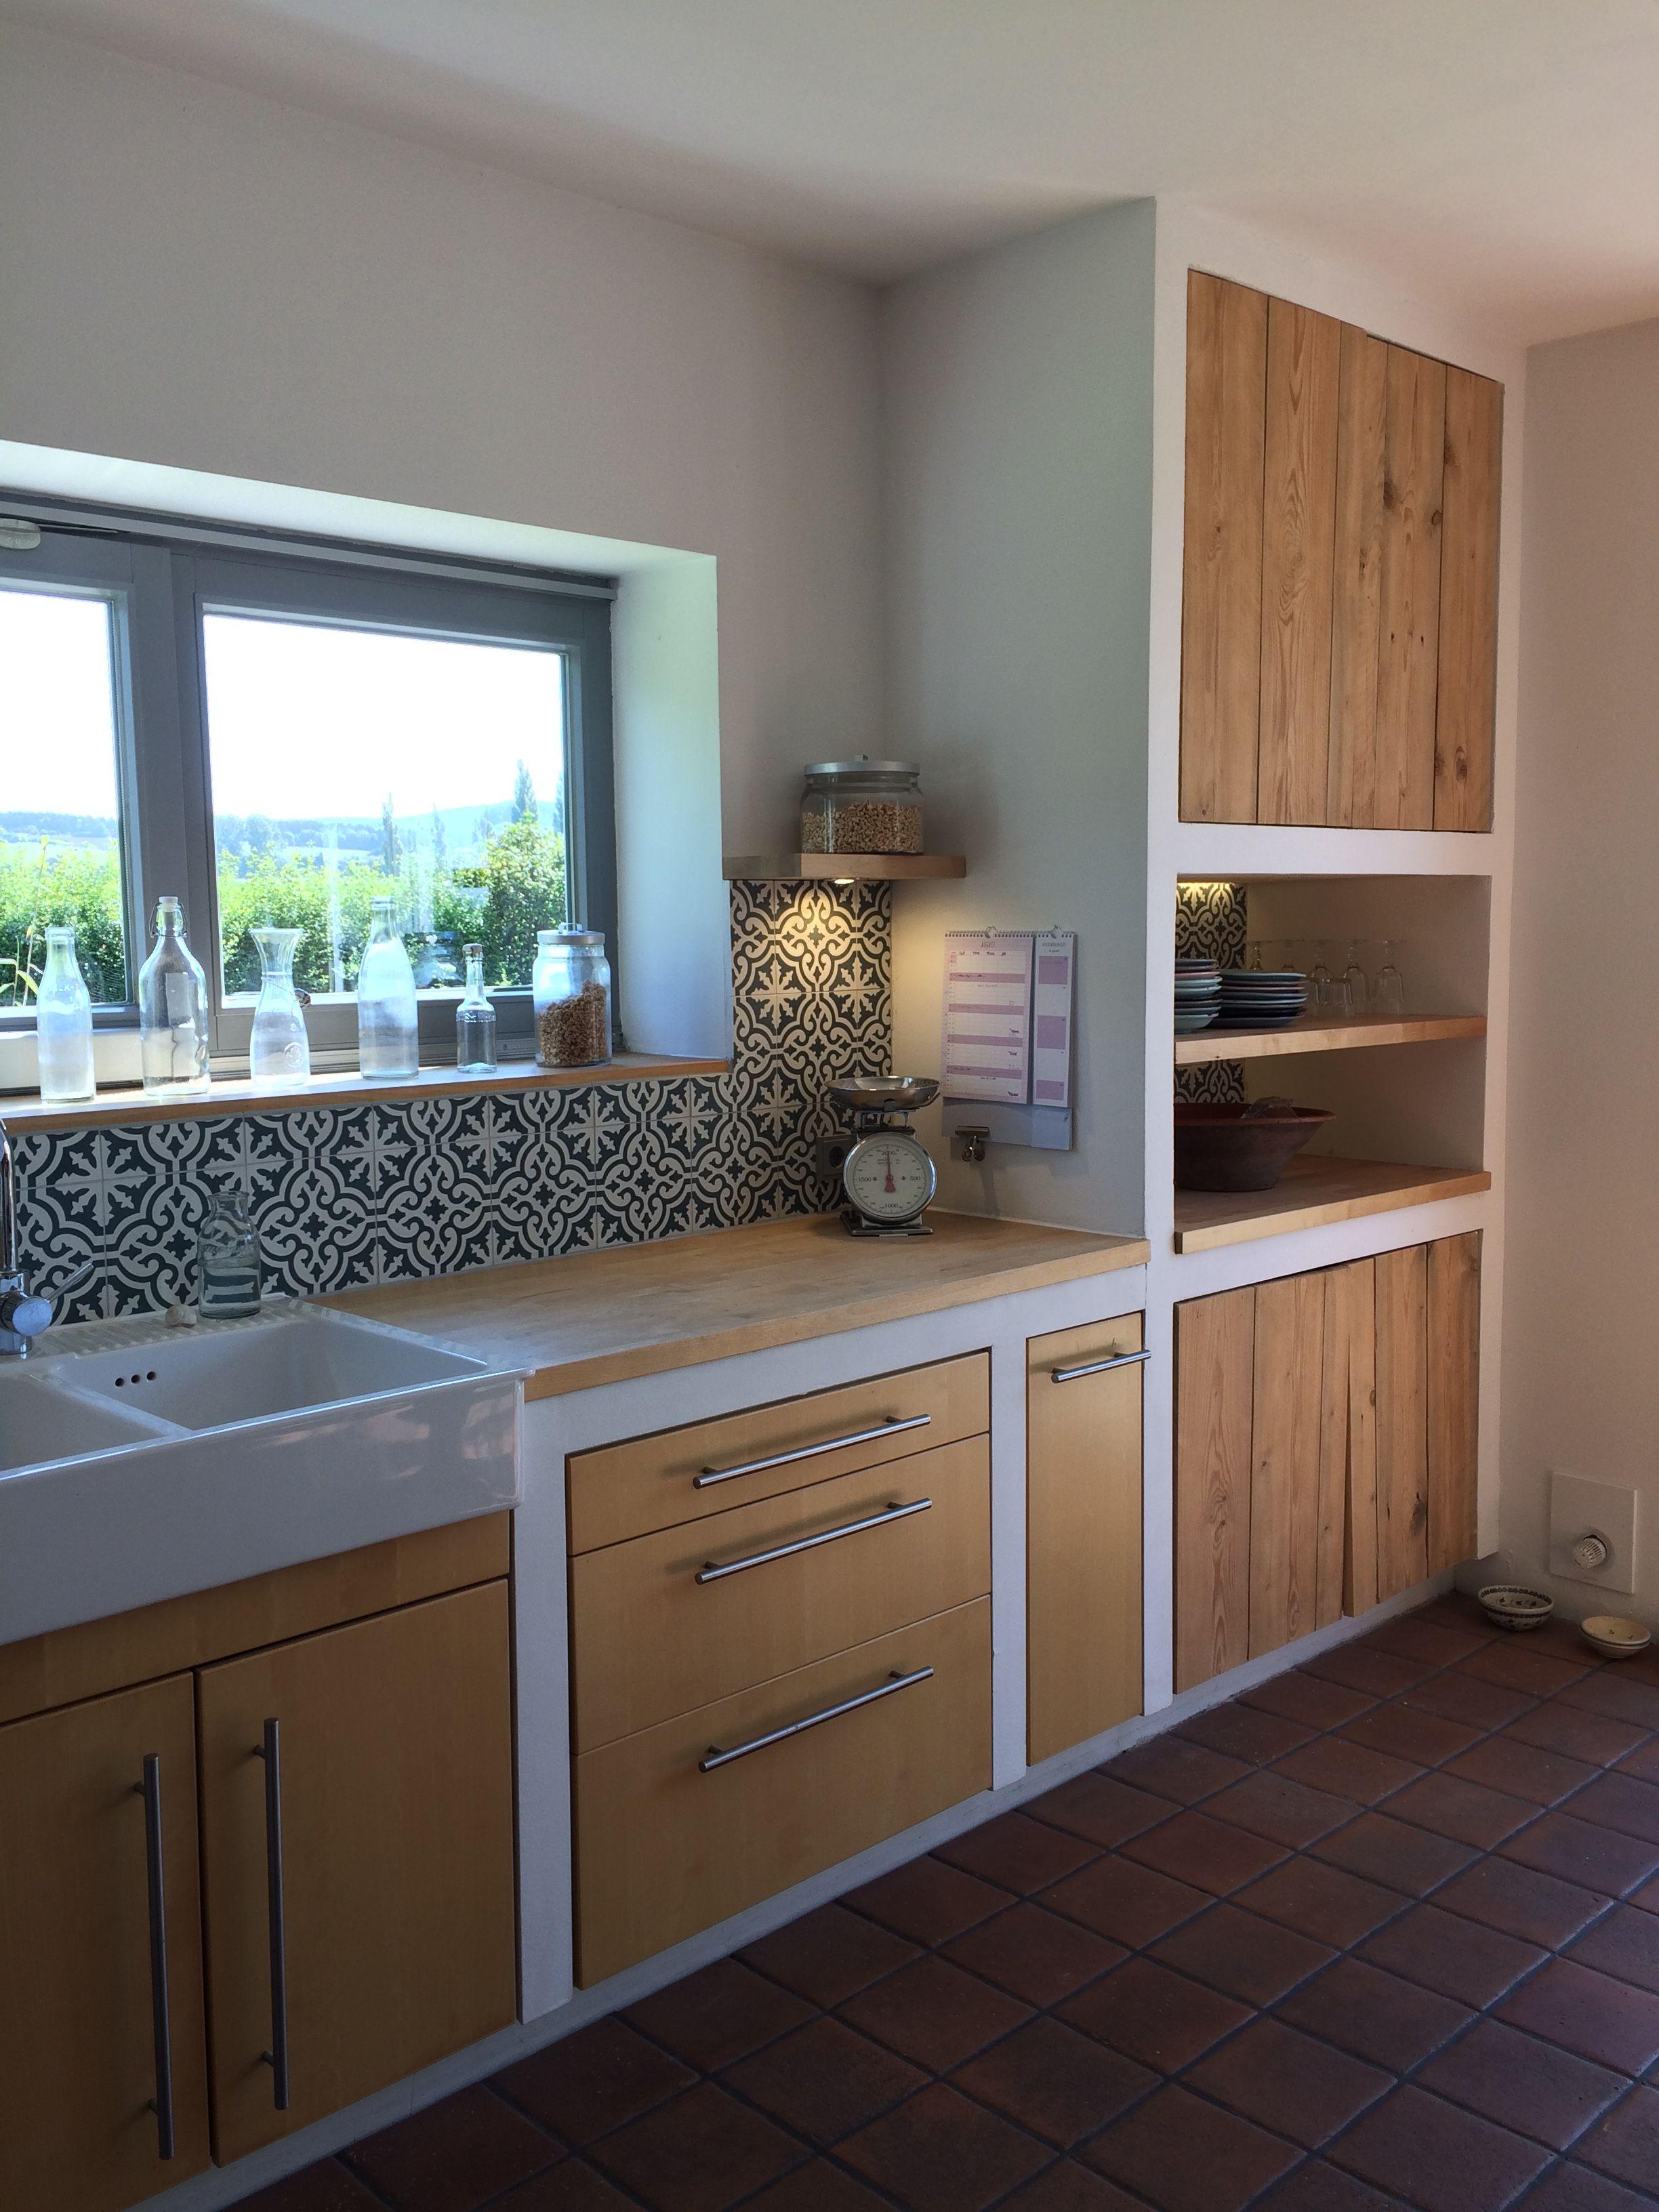 Gemauerte Küche  Cocinas de casa, Diseño muebles de cocina